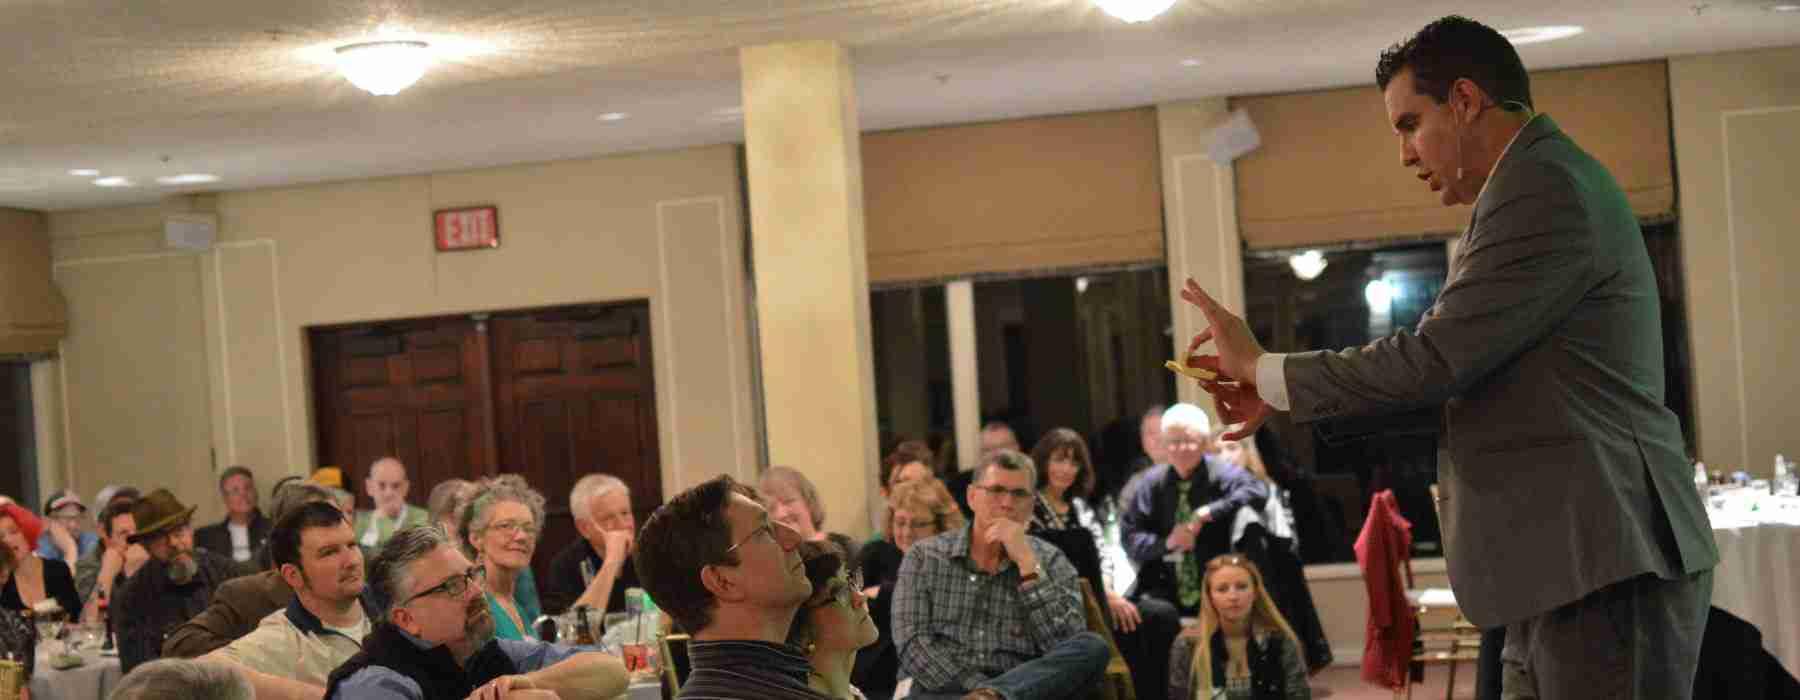 Portland magician performs for company banquet